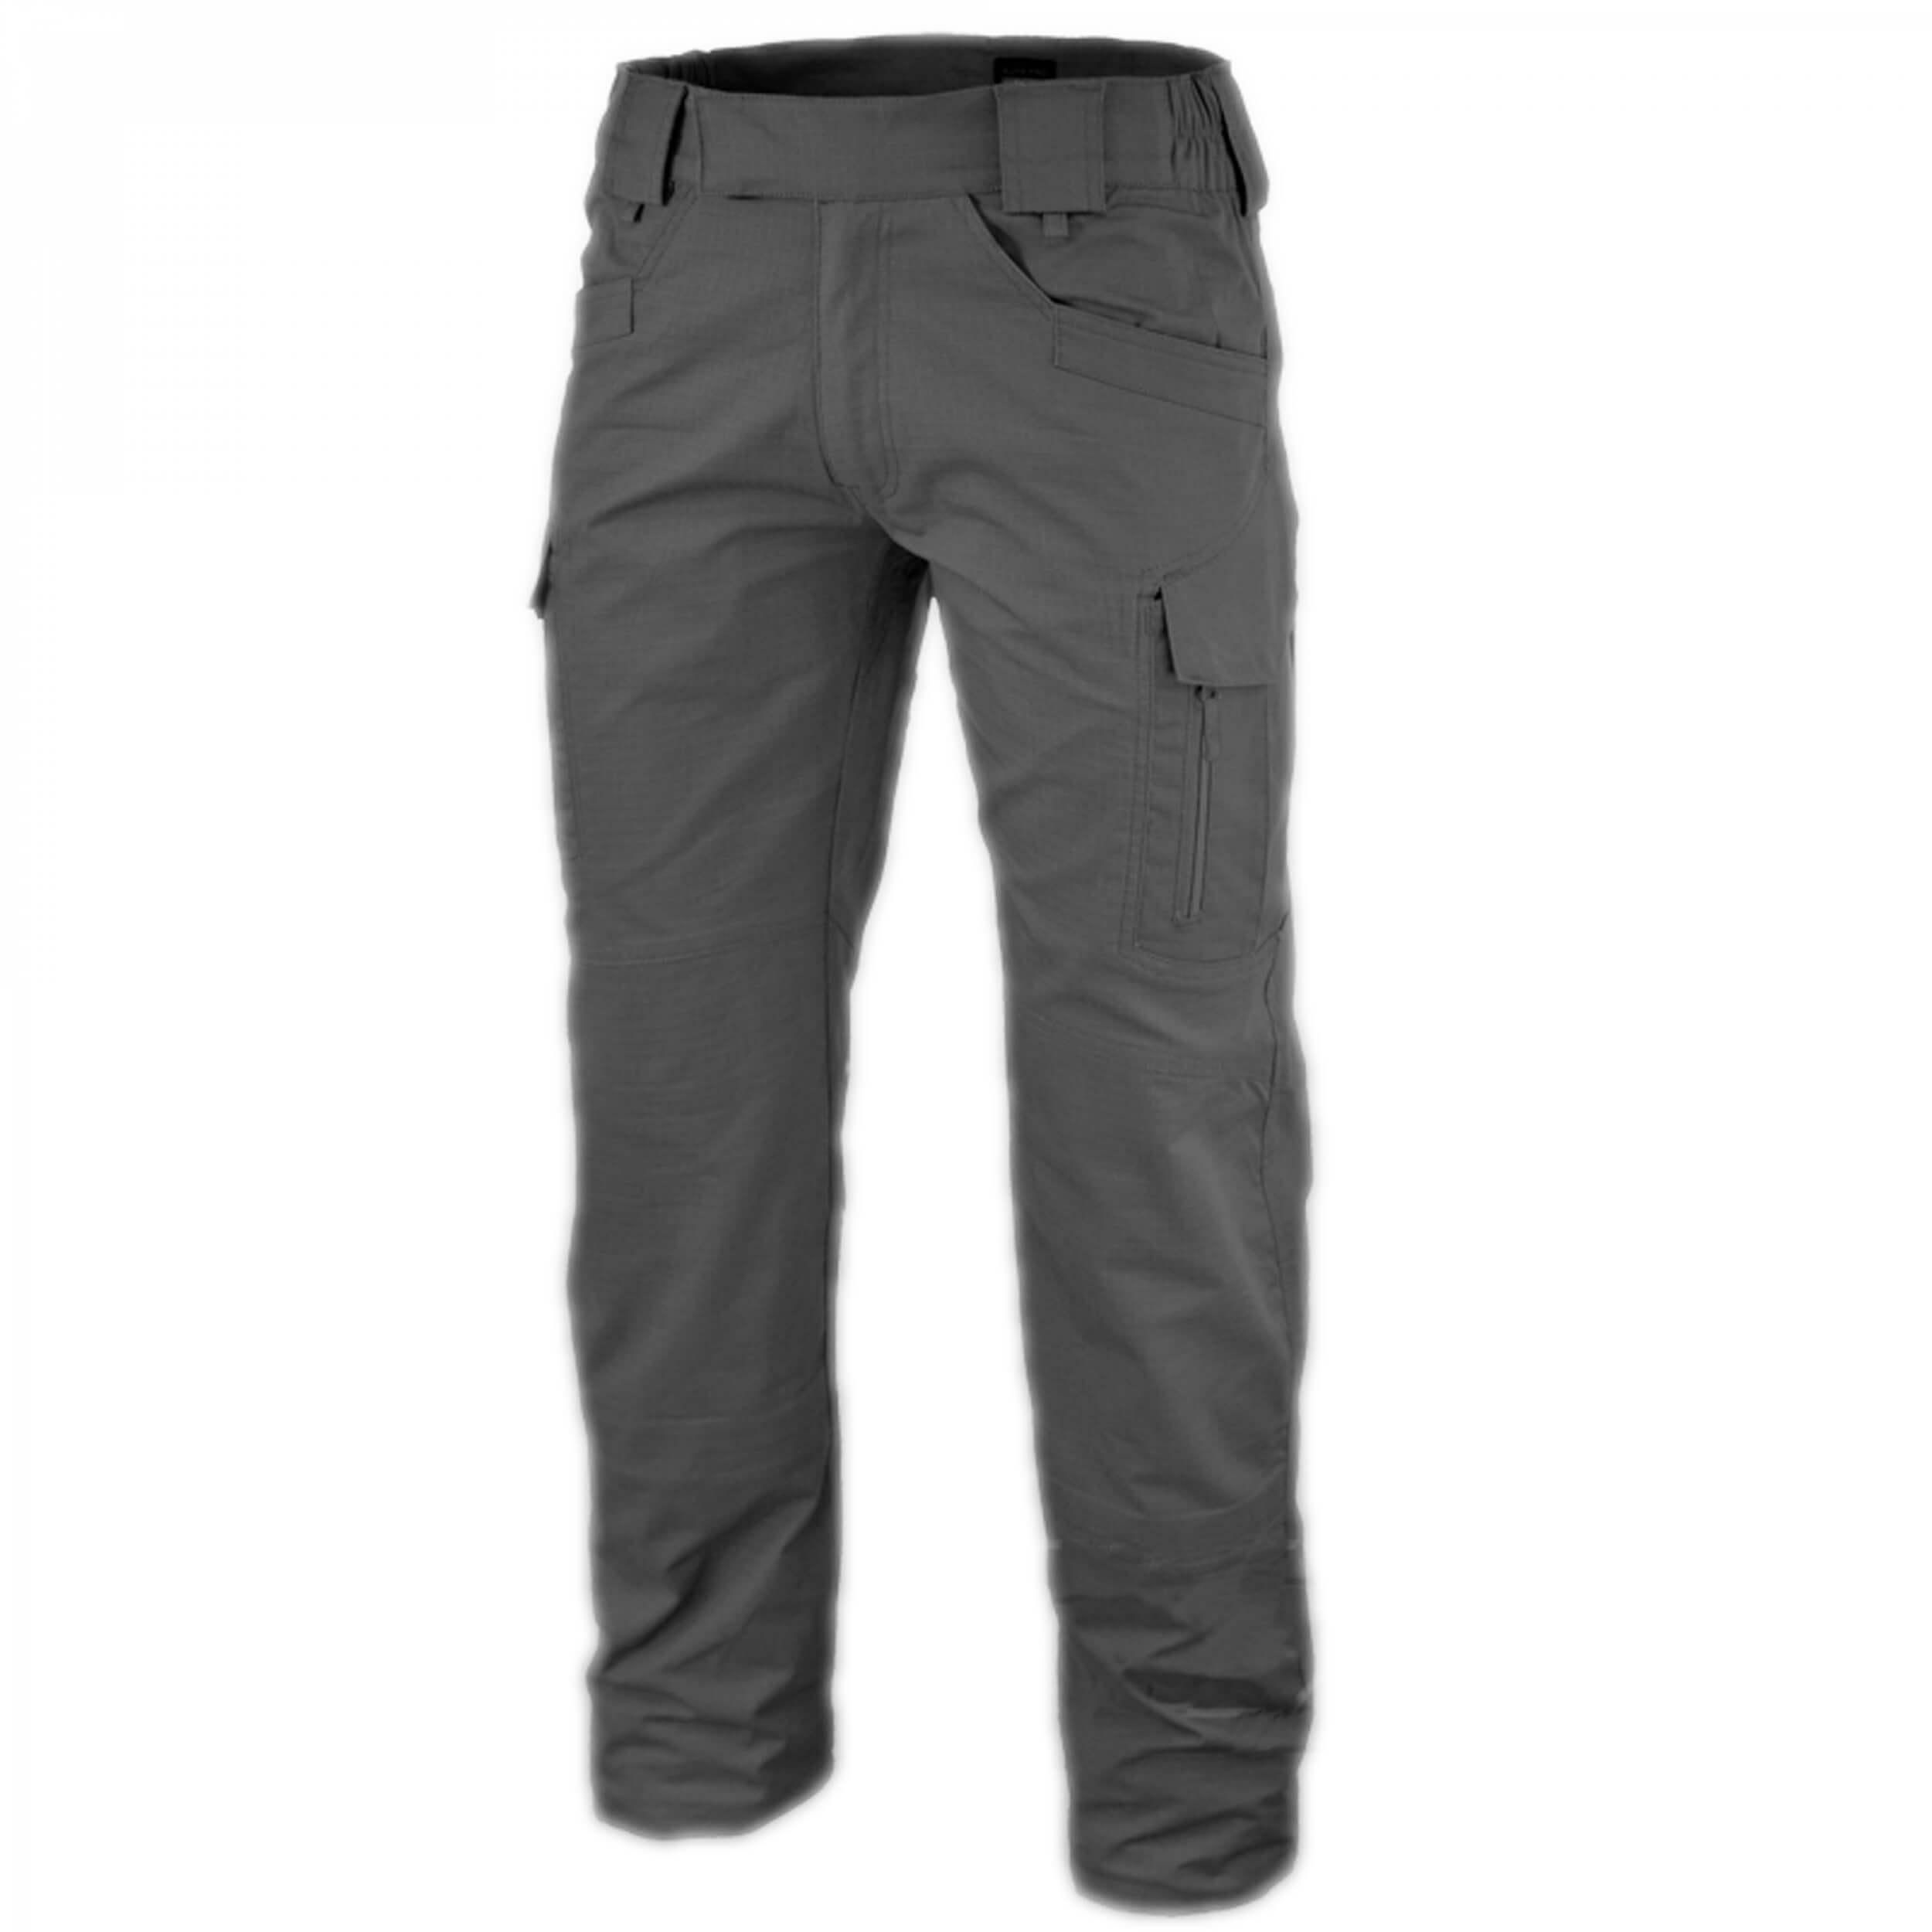 Texar Elite Pro Pants 2.0 ripstop